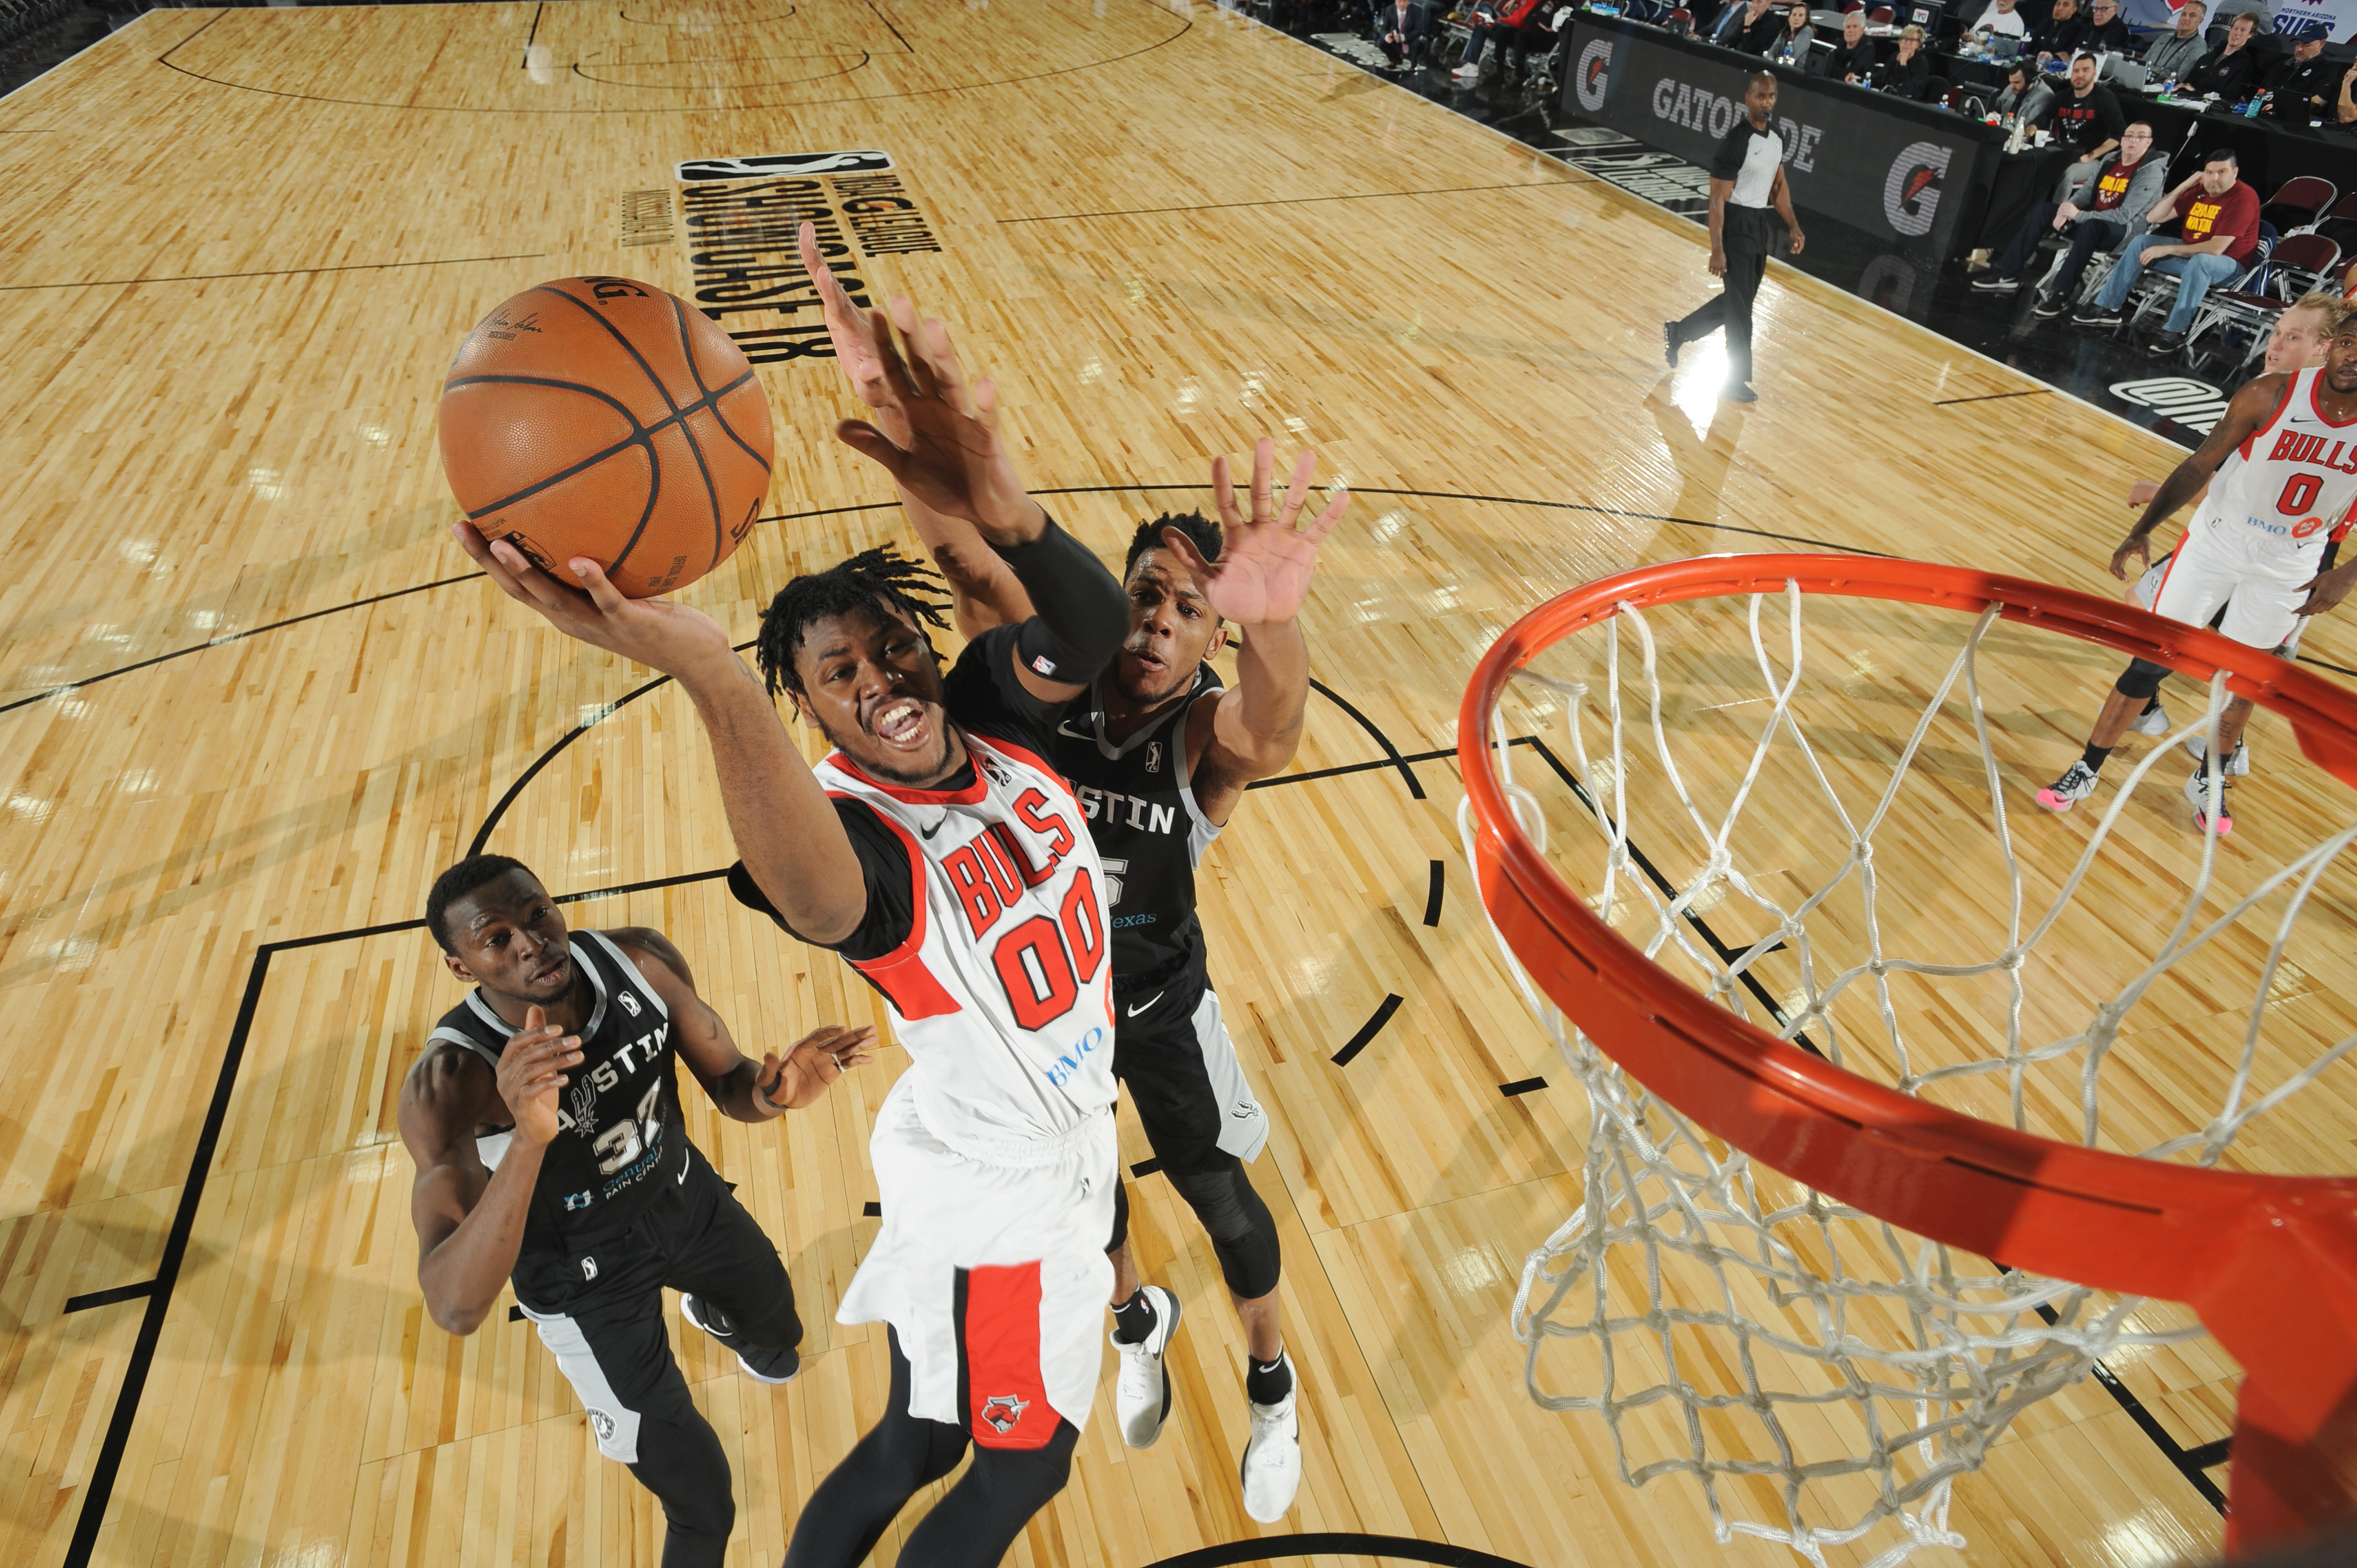 NBA G-League Showcase - Austin Spurs v Windy City Bulls